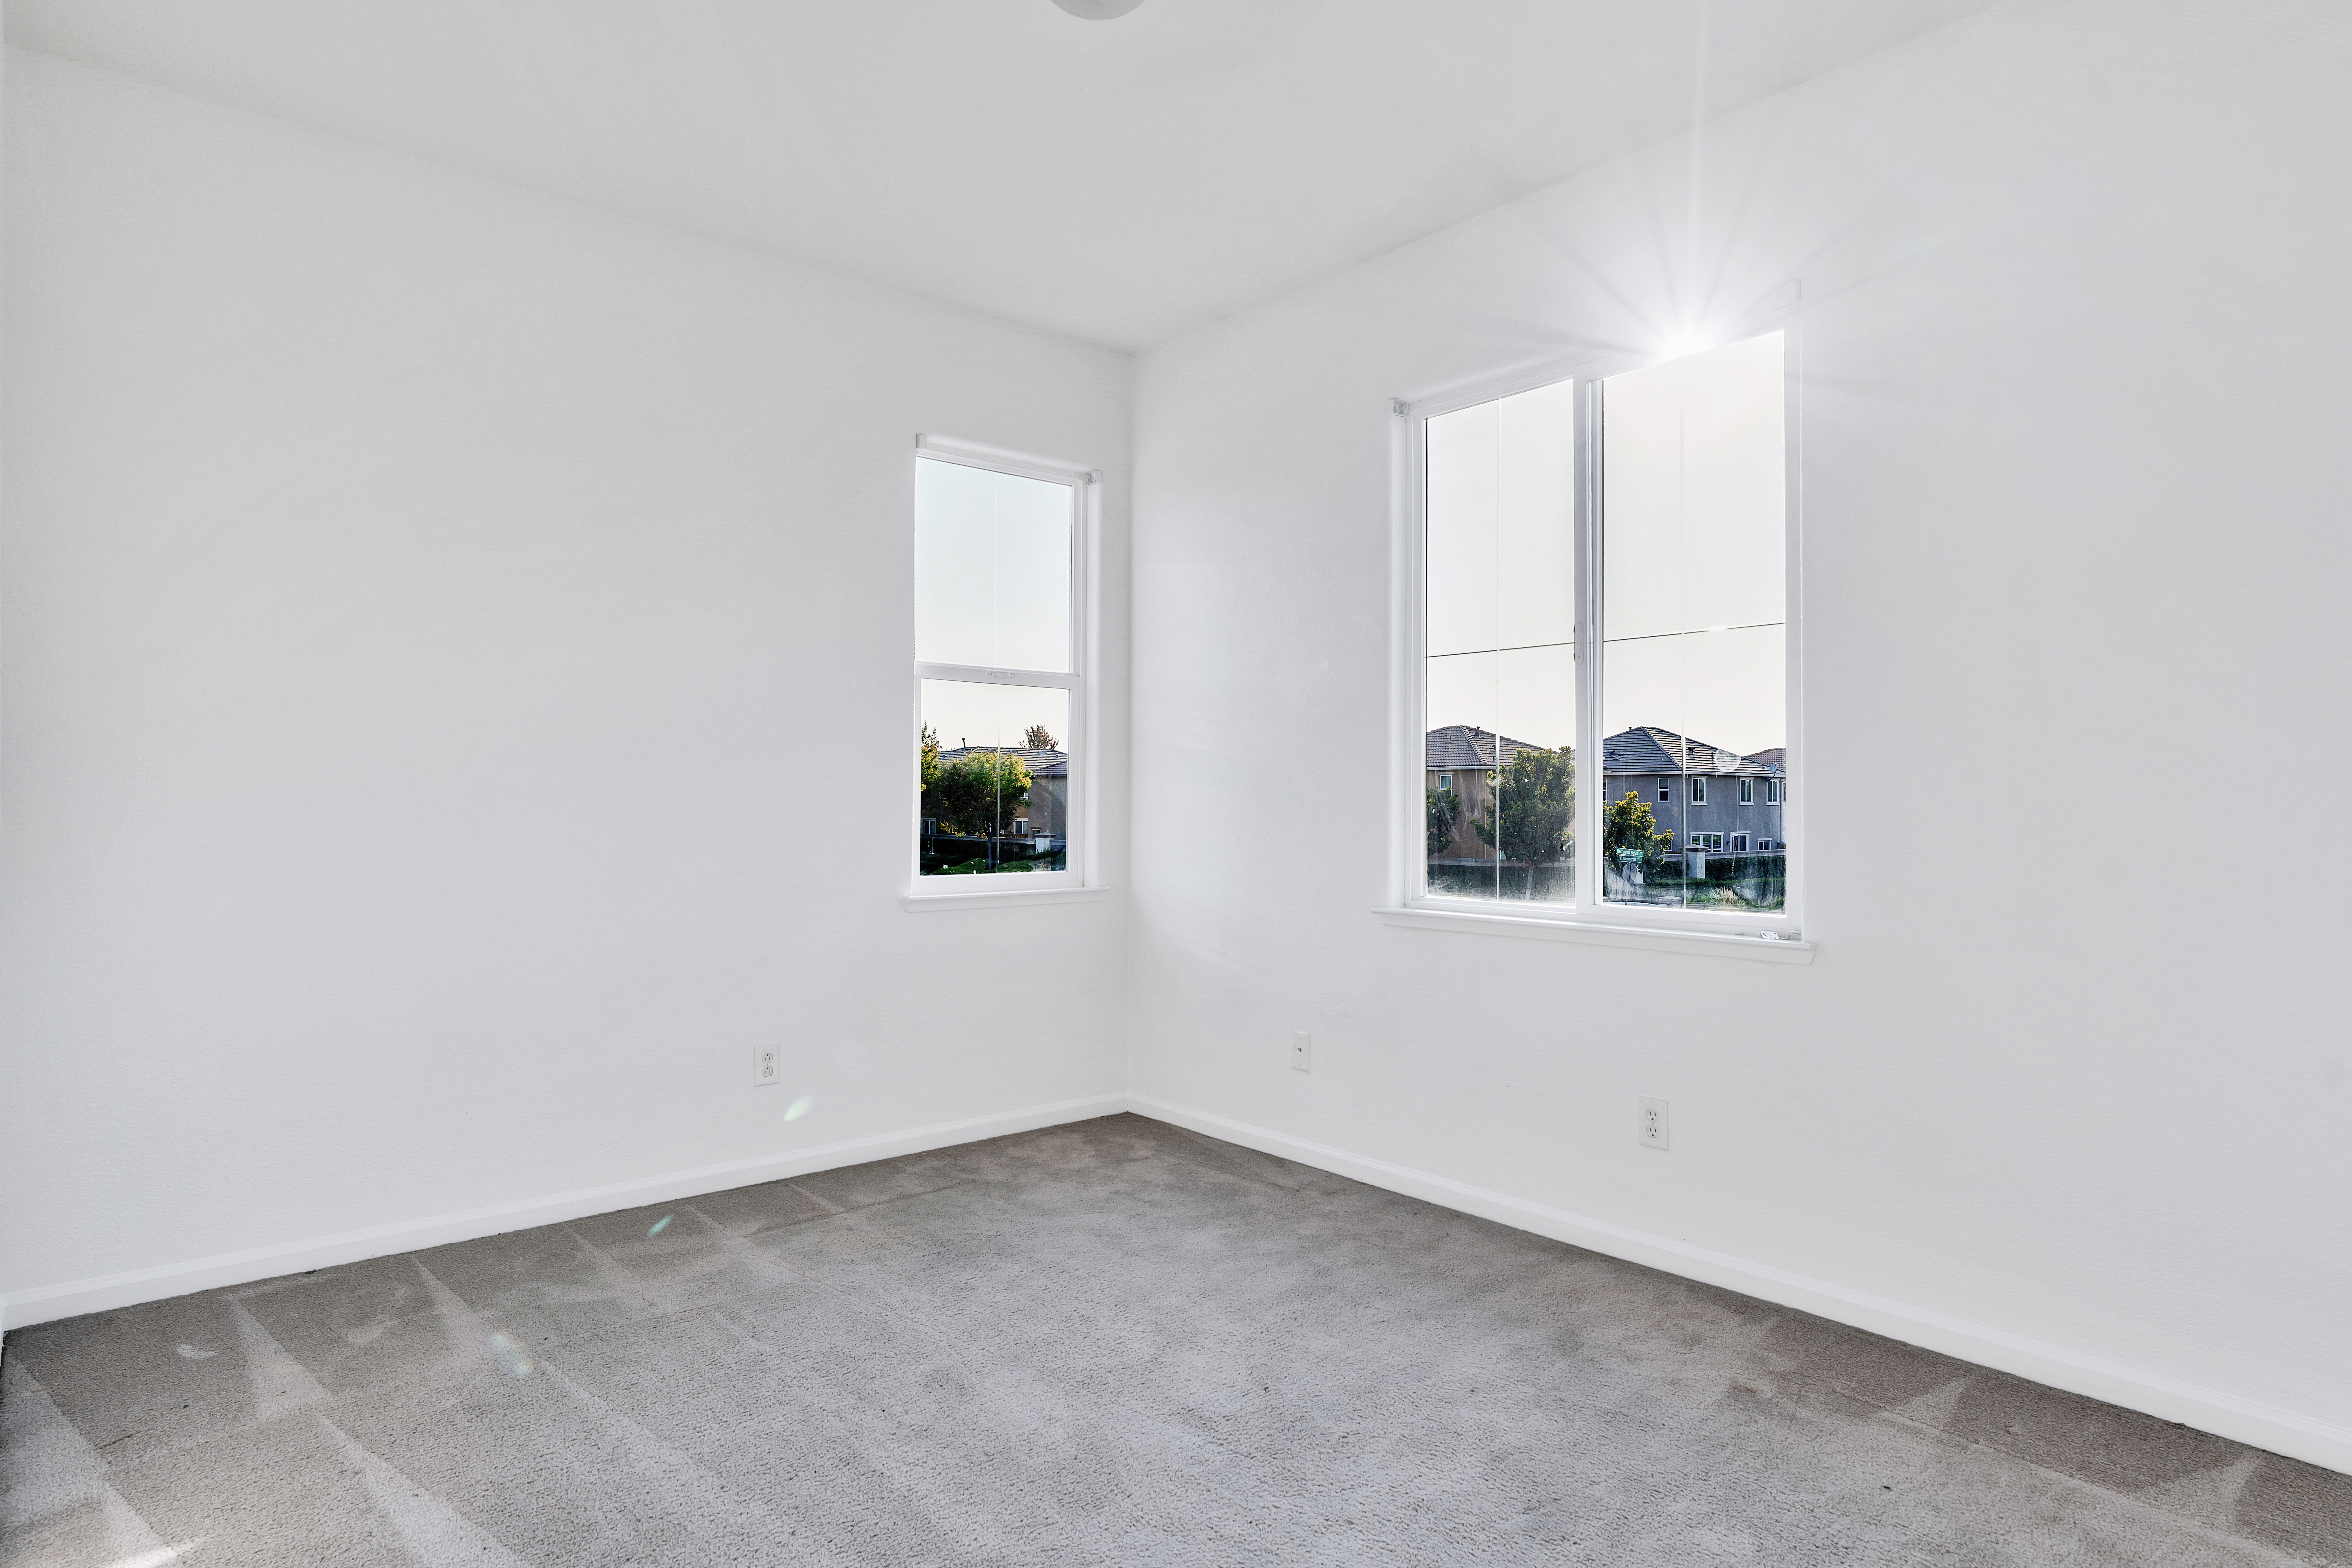 Second Bedroom of 17 Narwal Pl, Sacramento, Ca